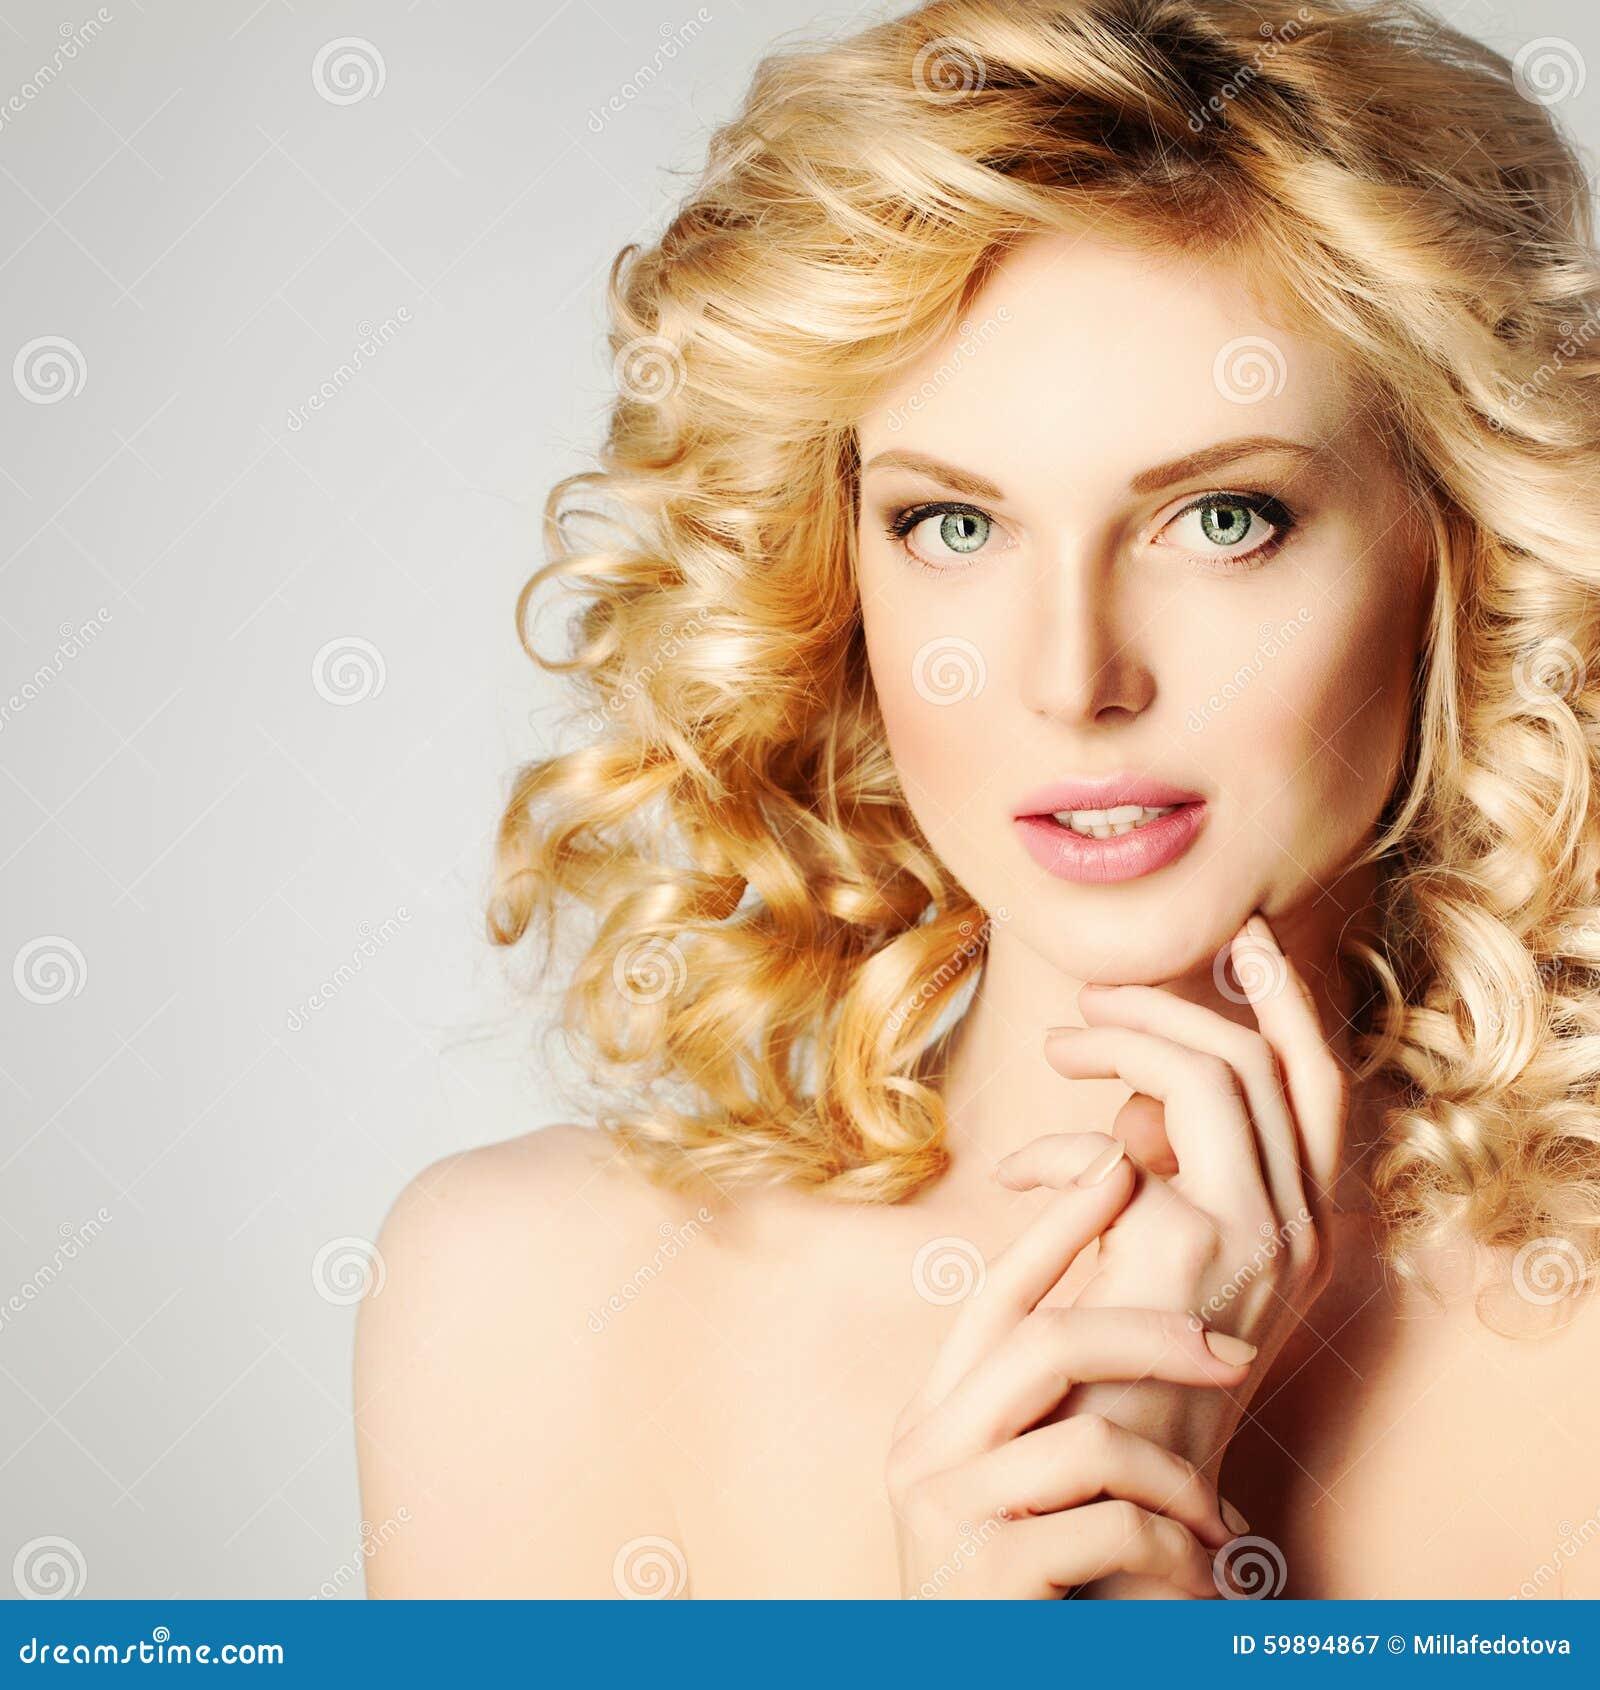 Fille de station thermale belle femme blonde avec les - Femme blonde photo ...